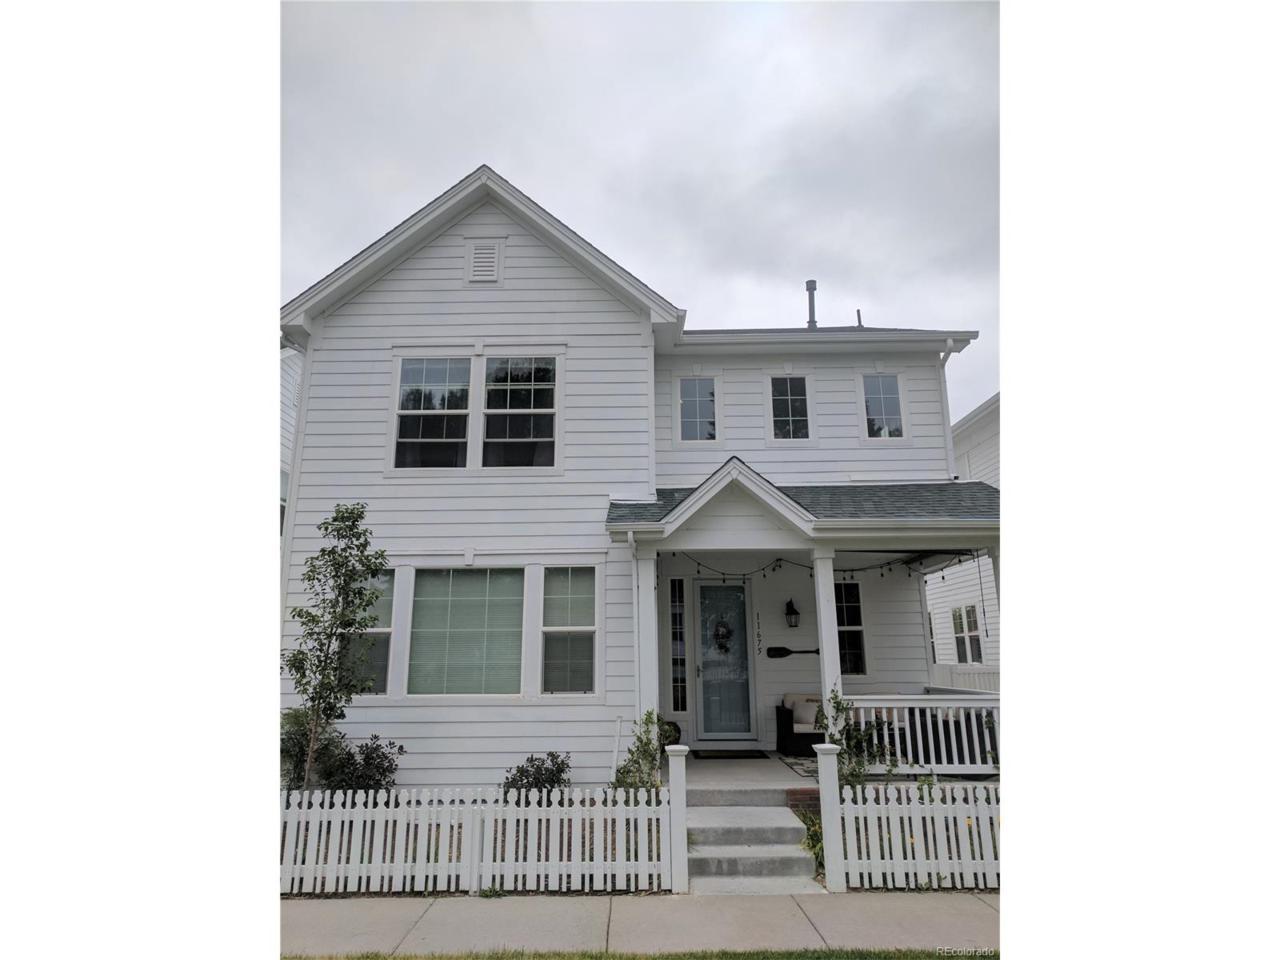 11675 Newton Street, Westminster, CO 80031 (MLS #8795833) :: 8z Real Estate